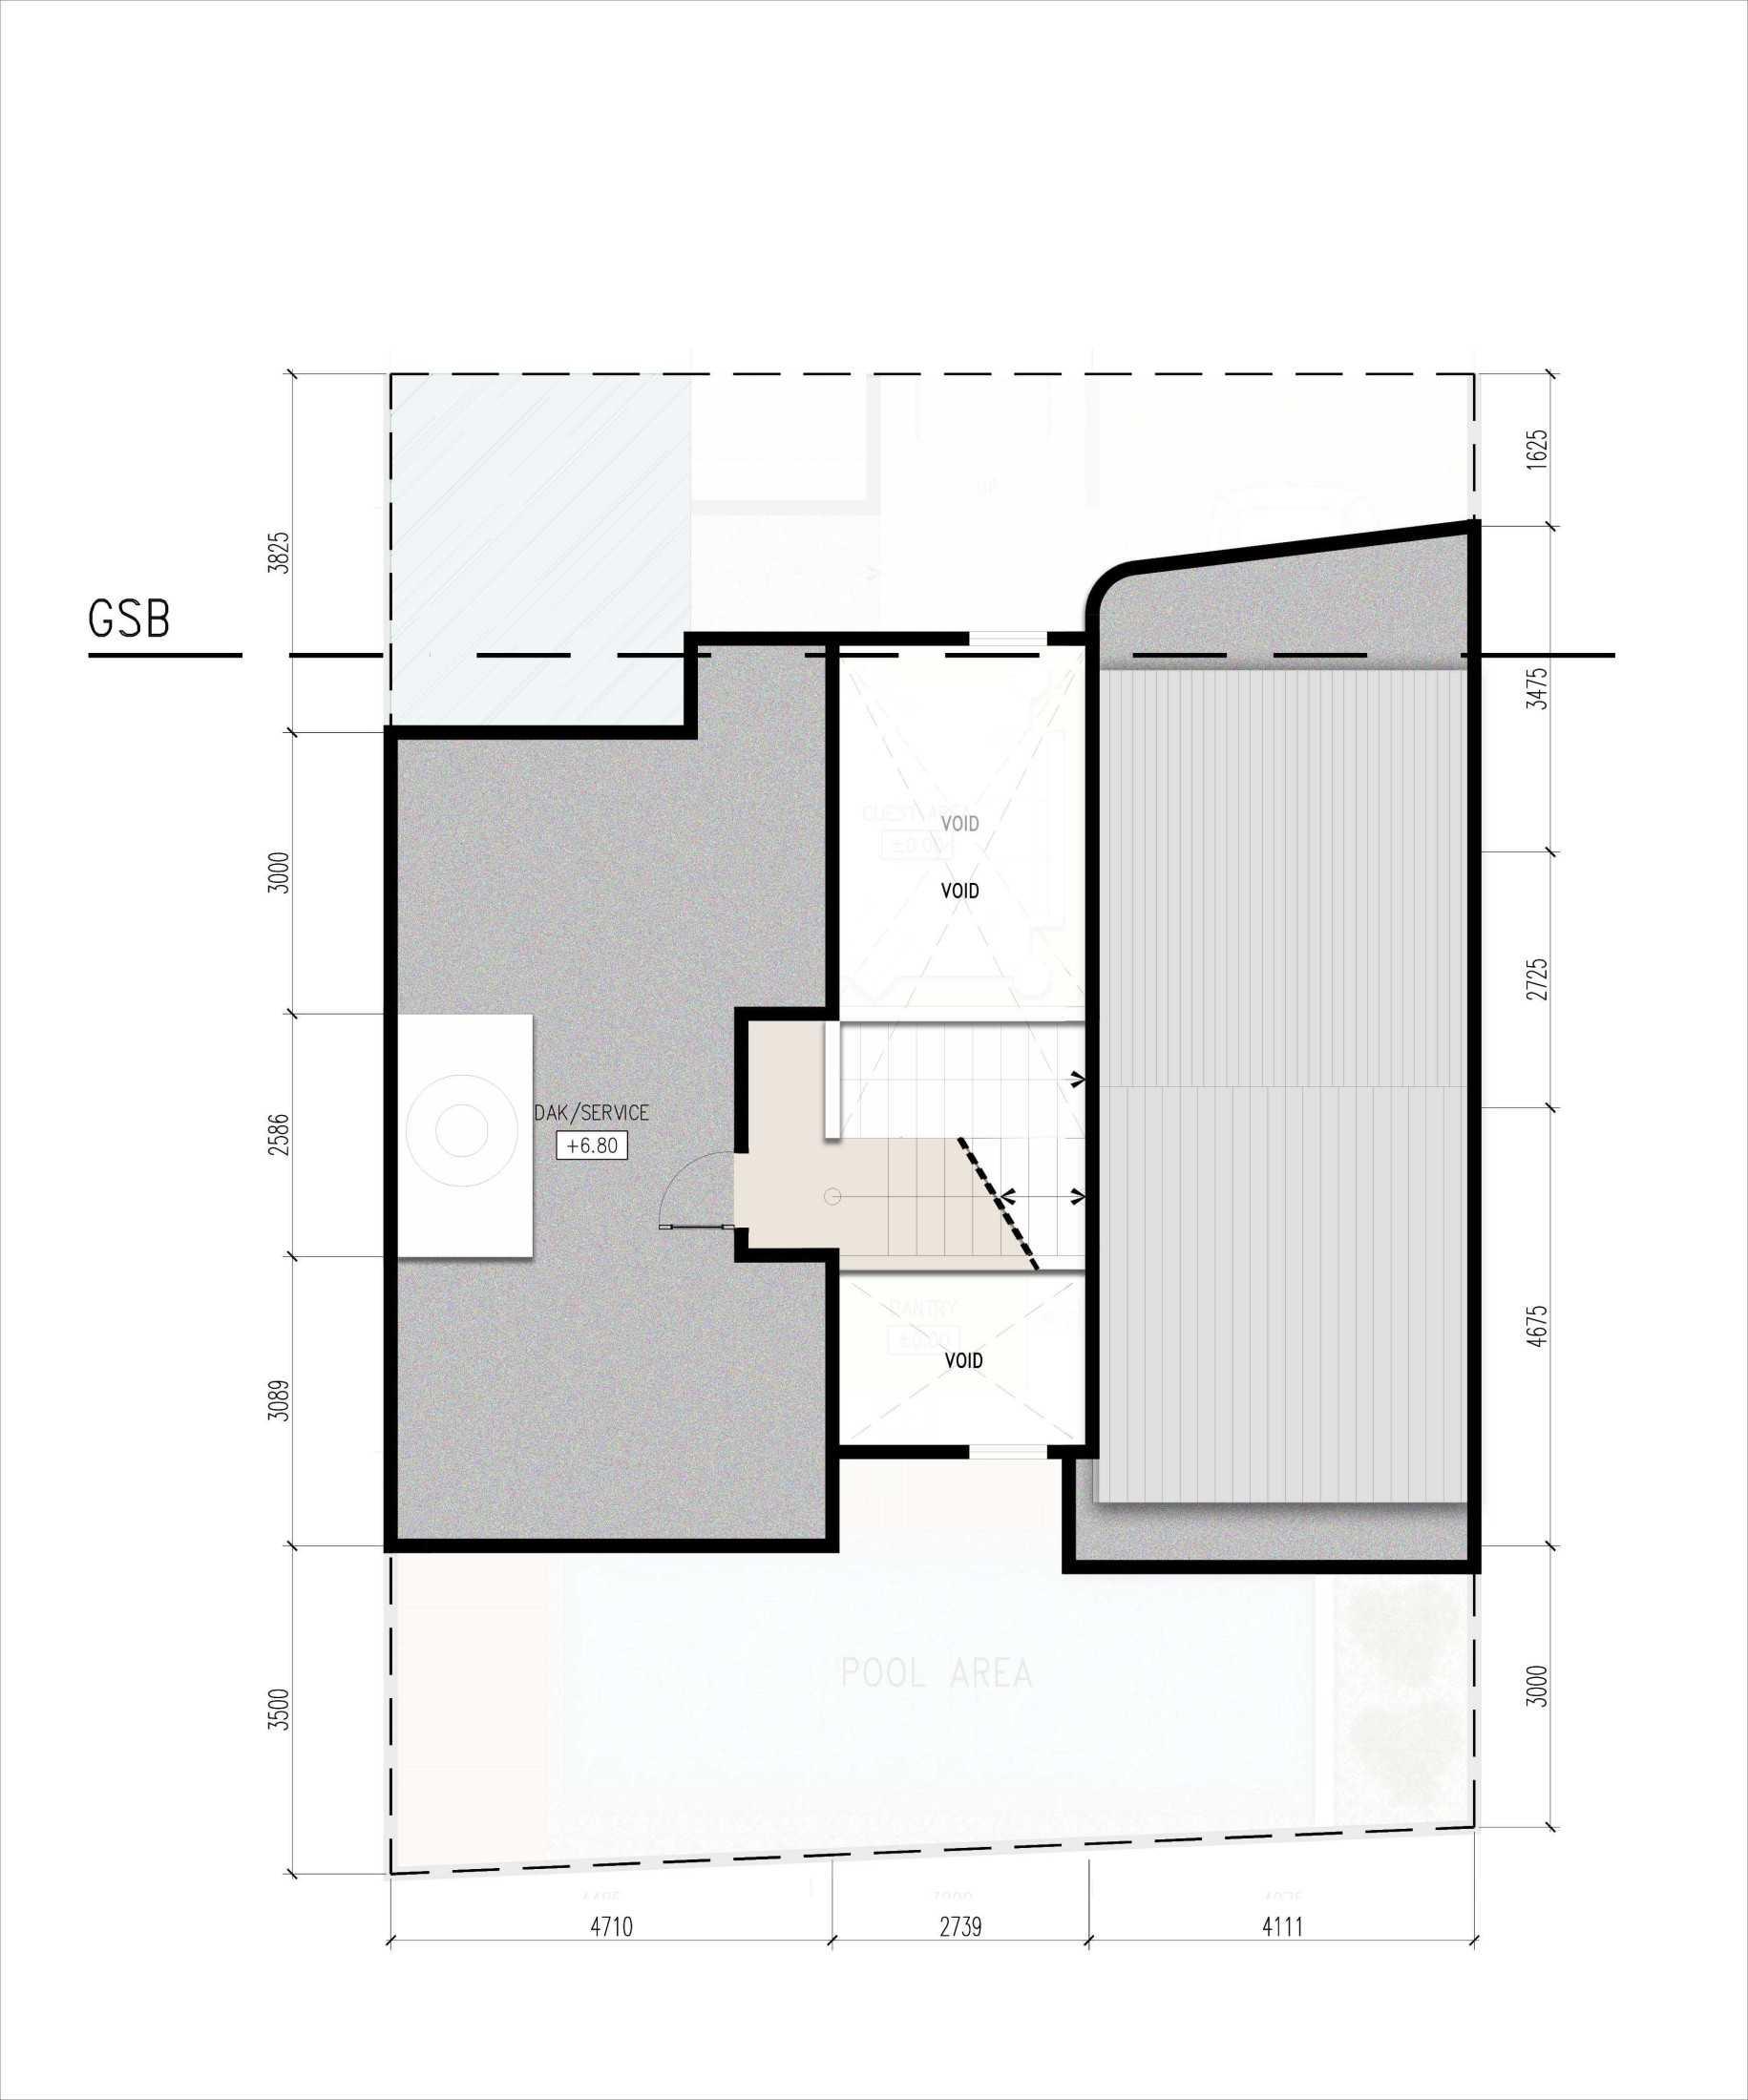 Zigzag Architecture Studio F House Cipinang, Pulo Gadung, Kota Jakarta Timur, Daerah Khusus Ibukota Jakarta, Indonesia Cipinang, Pulo Gadung, Kota Jakarta Timur, Daerah Khusus Ibukota Jakarta, Indonesia Zigzag-Architecture-Studio-F-House  56838